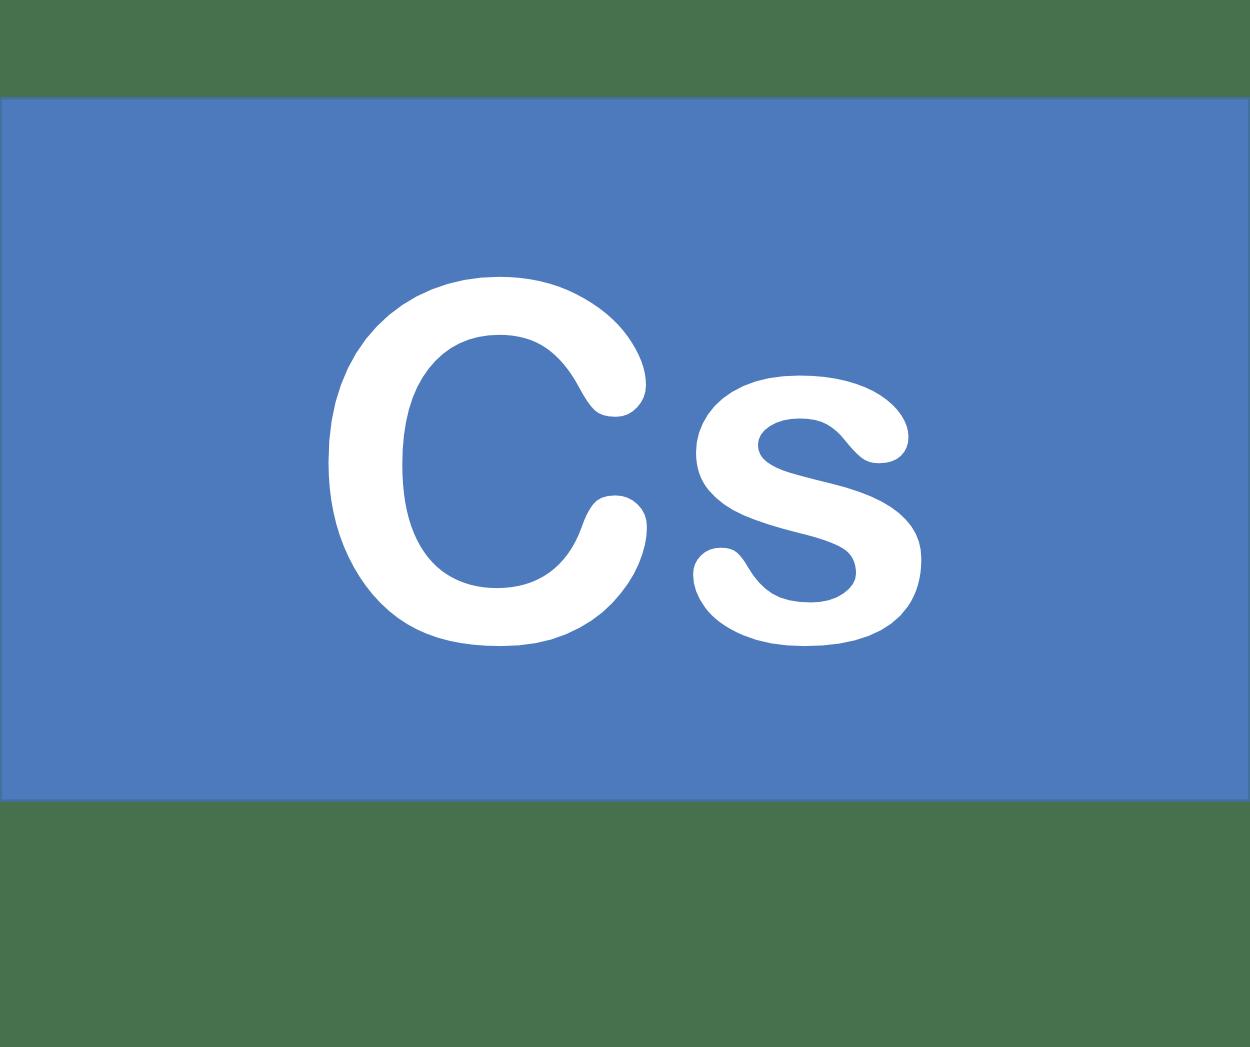 55 Cs セシウム Caesium 元素 記号 周期表 化学 原子